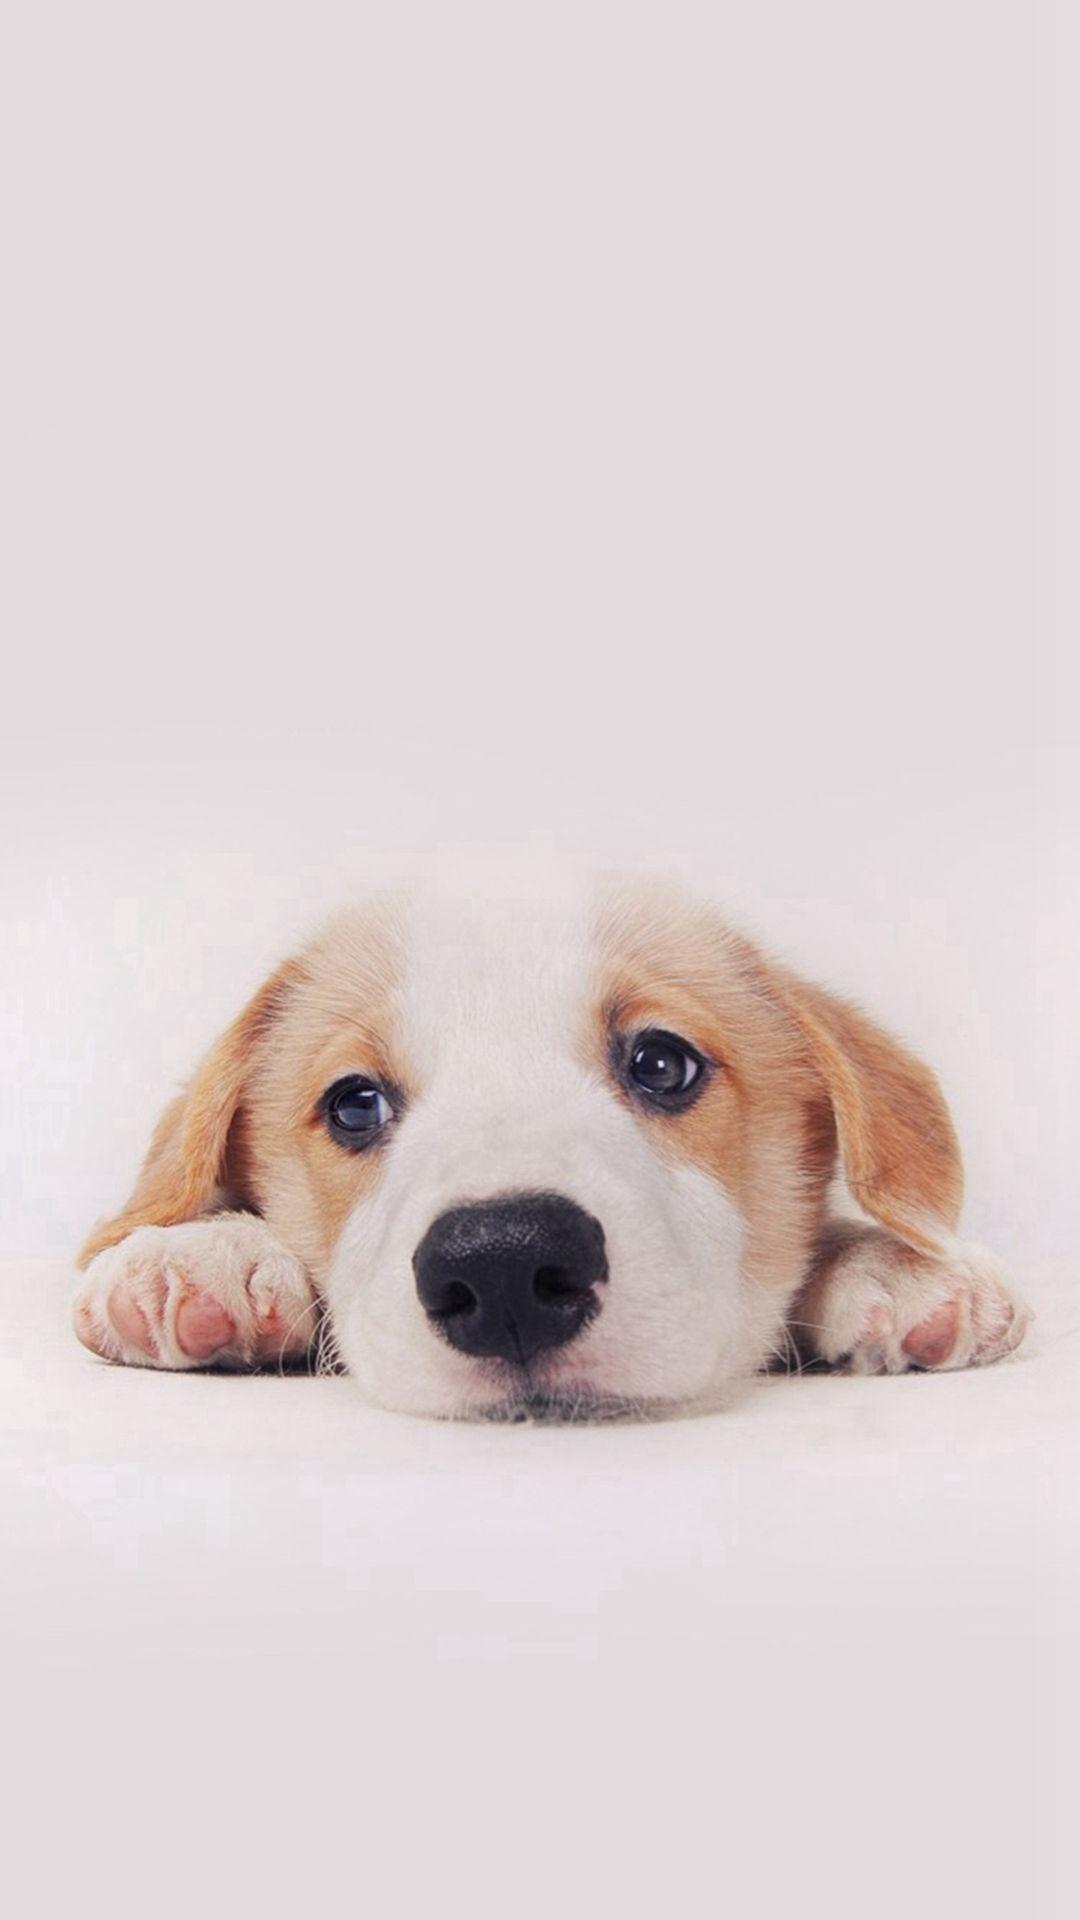 cute puppy dog pet #iphone #6 #plus #wallpaper | iphone 6